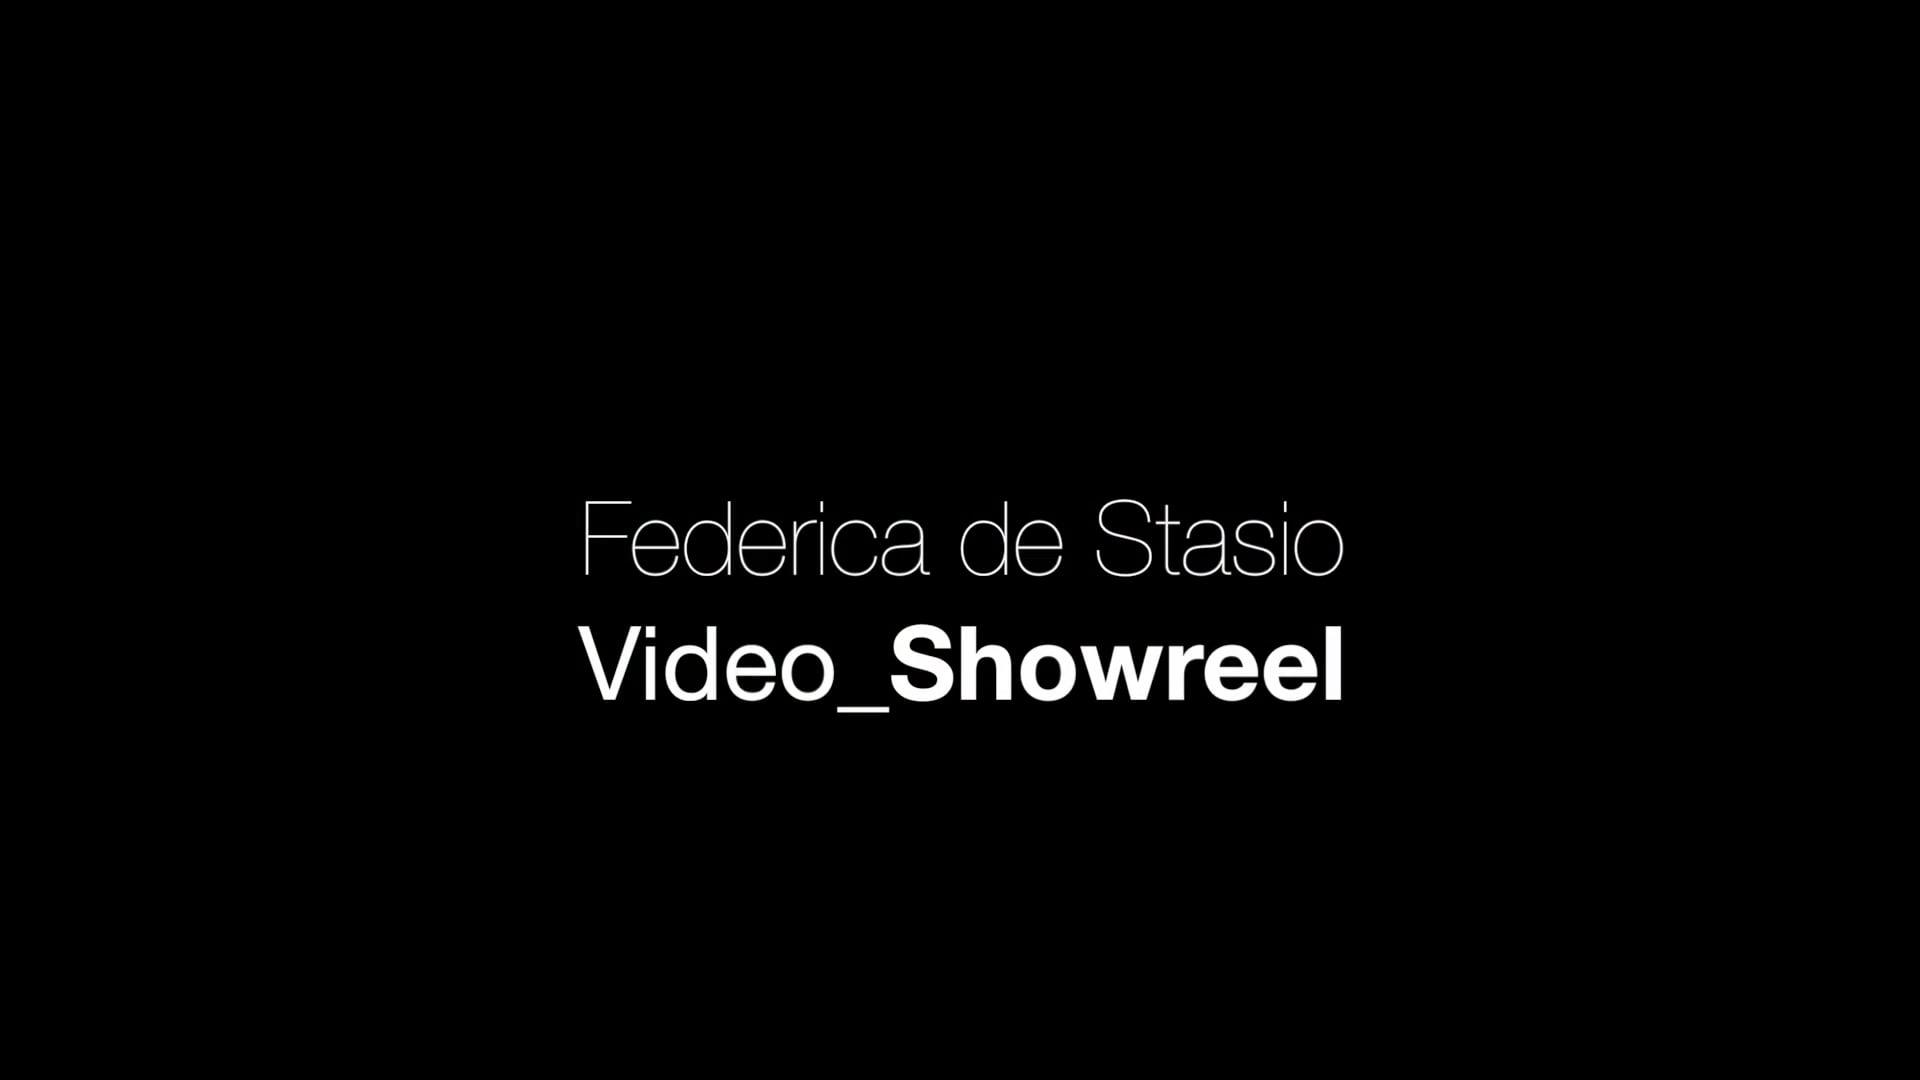 Federica de Stasio VIDEO SHOWREEL